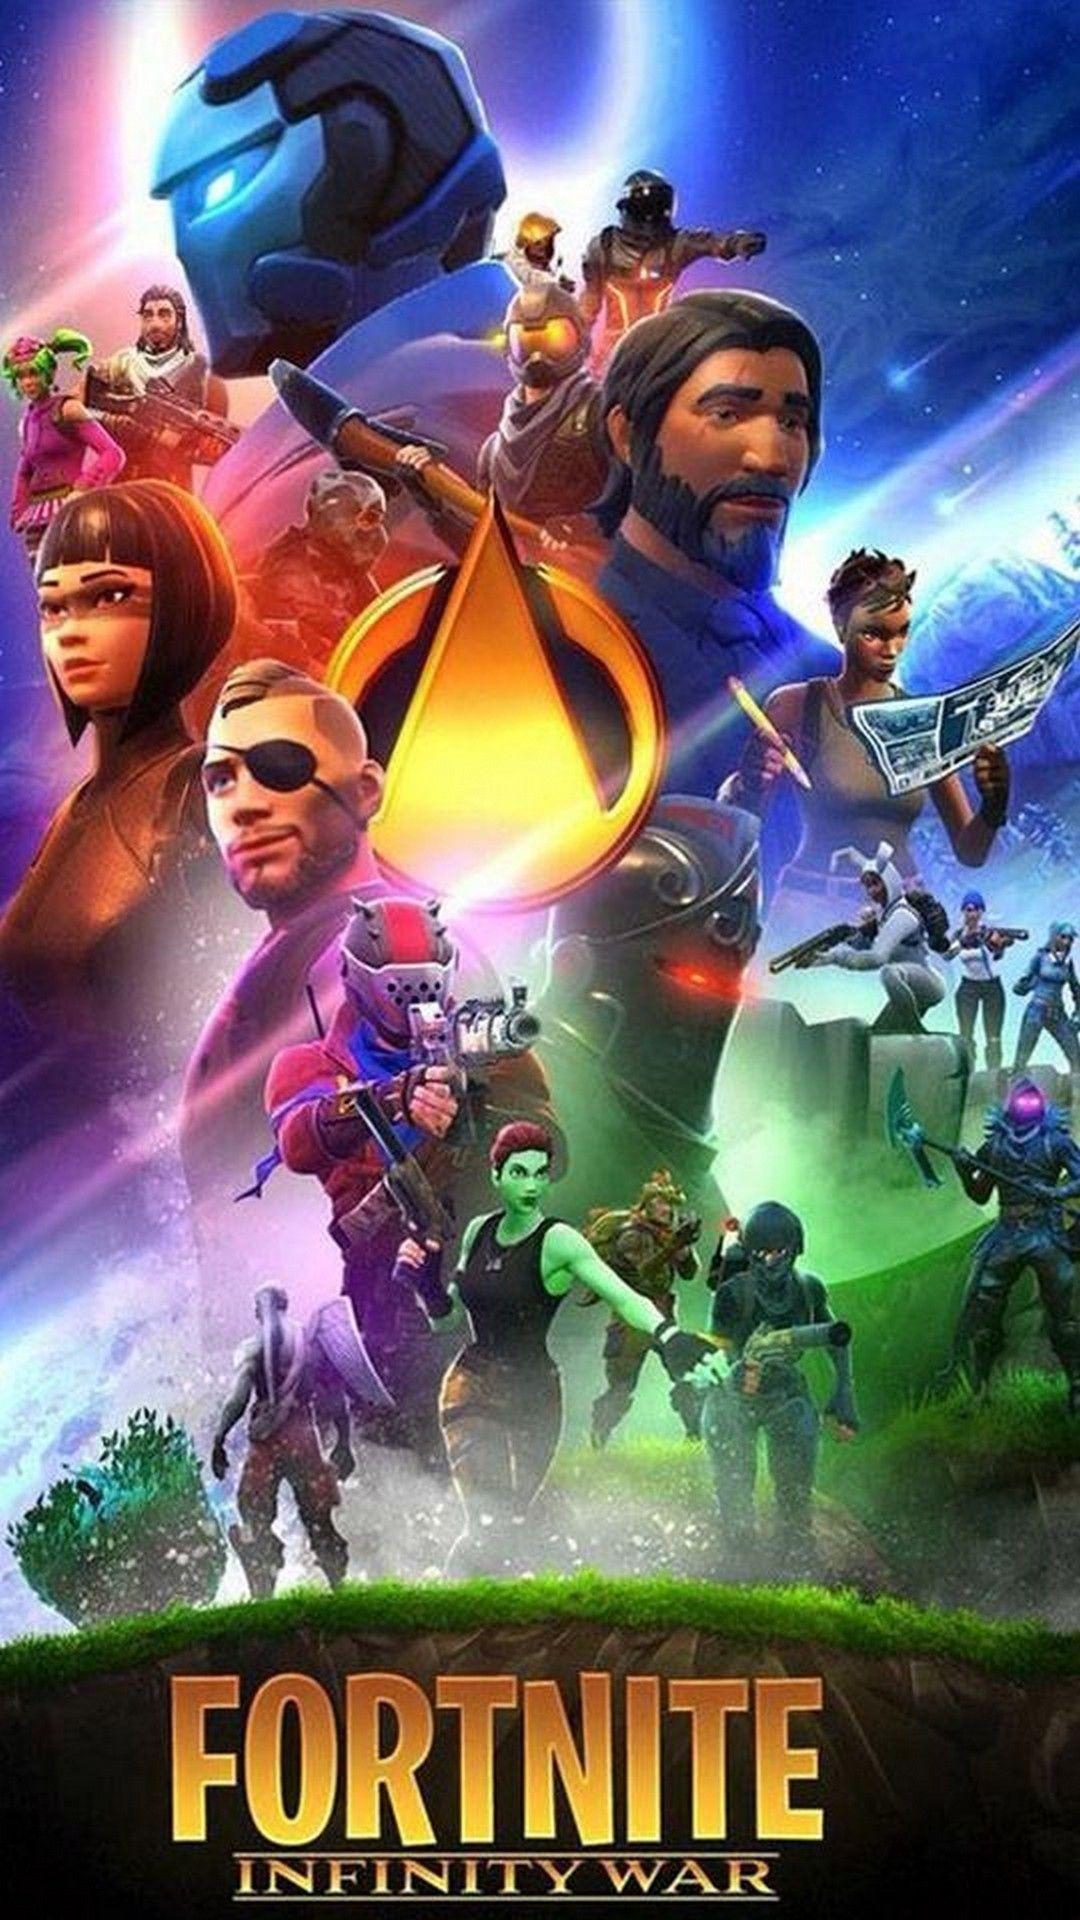 Pin By Brenda Roberts On Josiah S Favorites Video Game Memes Epic Games Fortnite Gaming Wallpapers